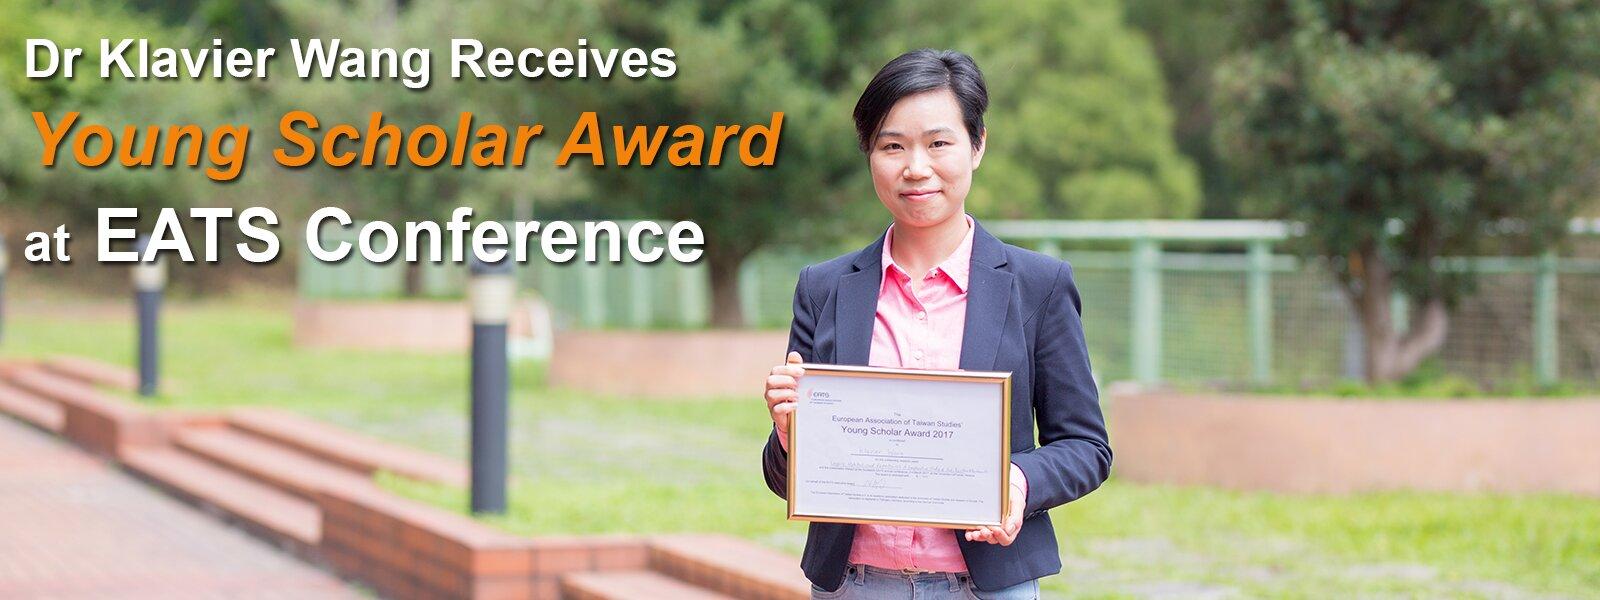 Dr Klavier Wang Receives Young Scholar Award at EATS Conference